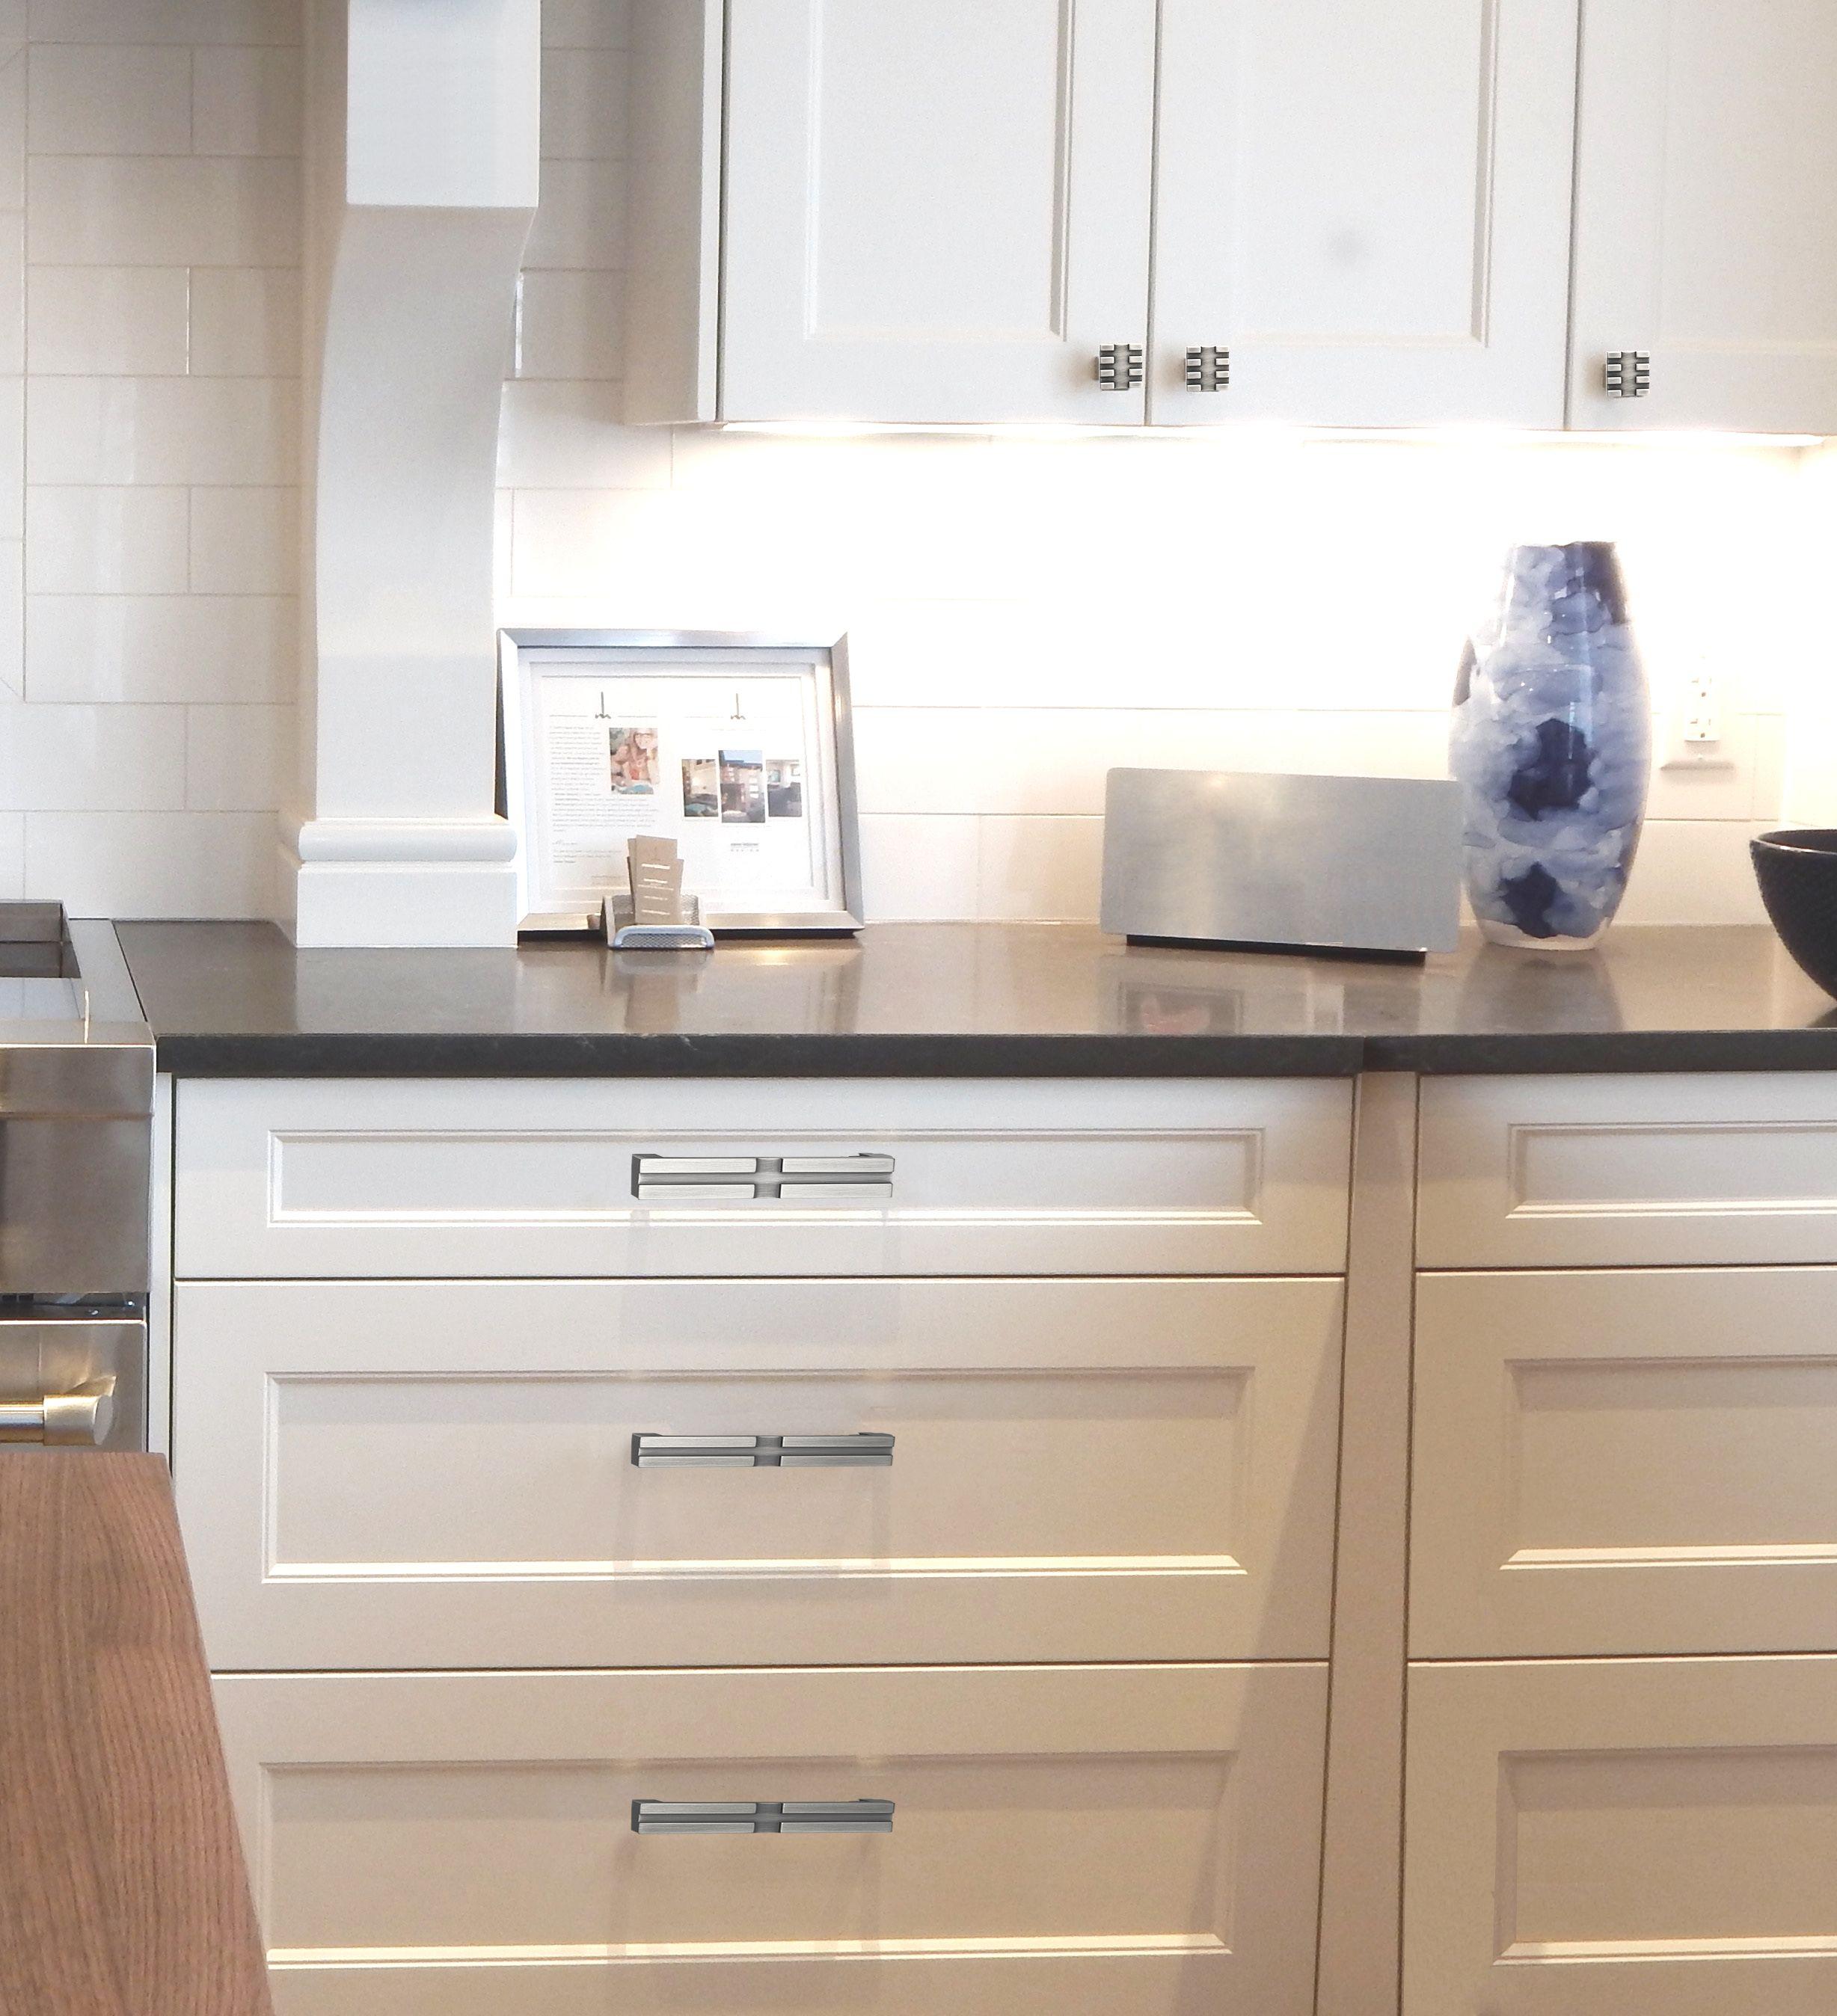 Tiradores para muebles de cocina cool muebles de madera - Tiradores para muebles de cocina ...